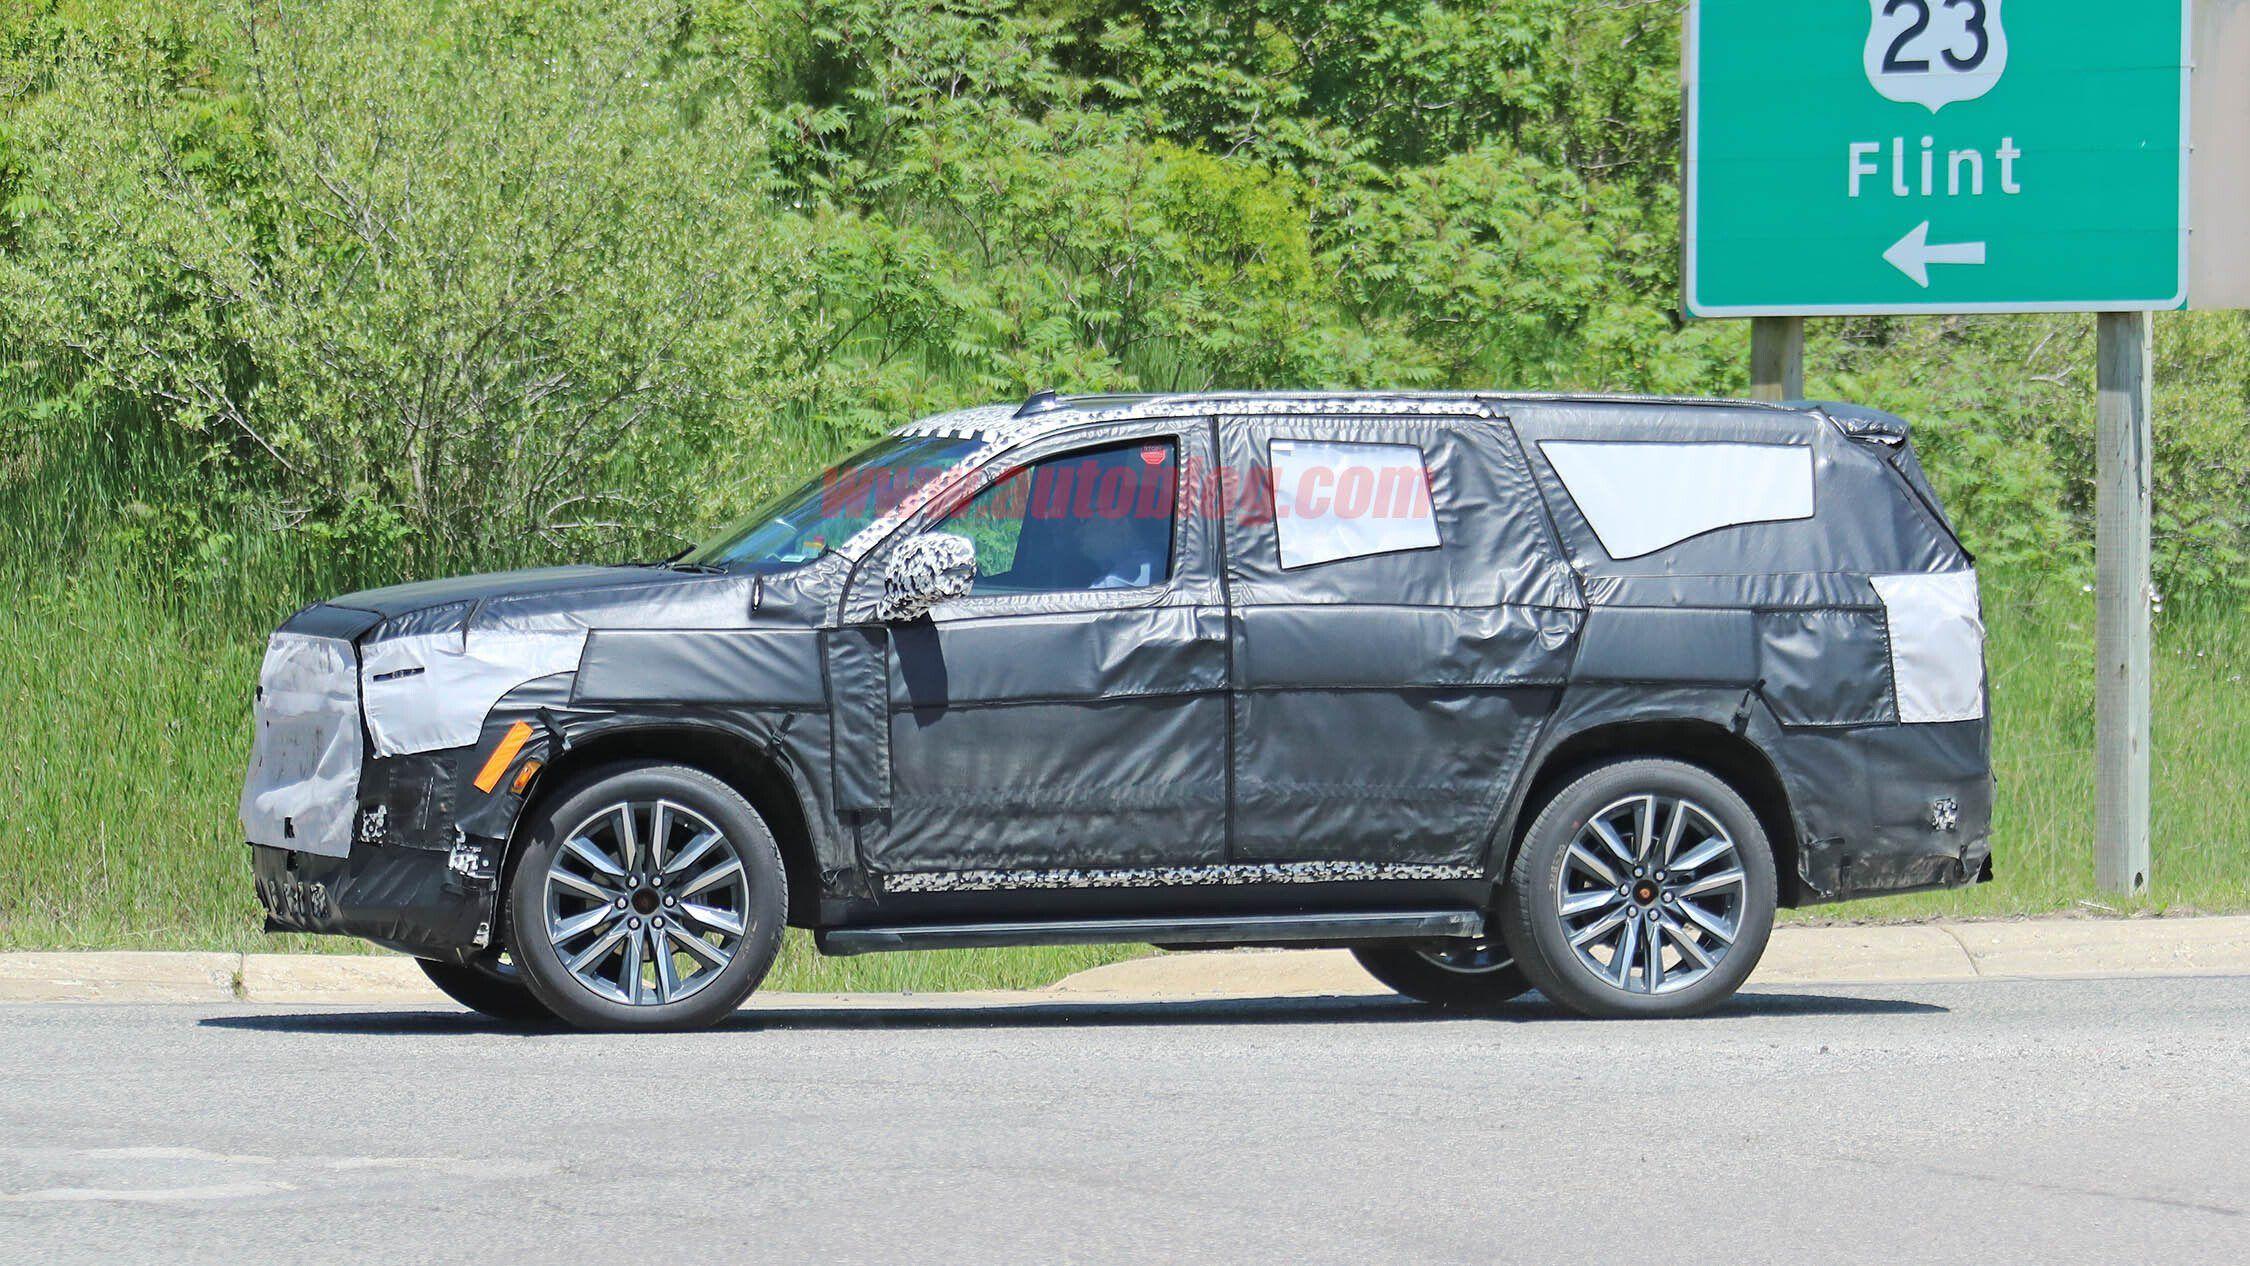 2021 Spy Shots Toyota Prius Prices